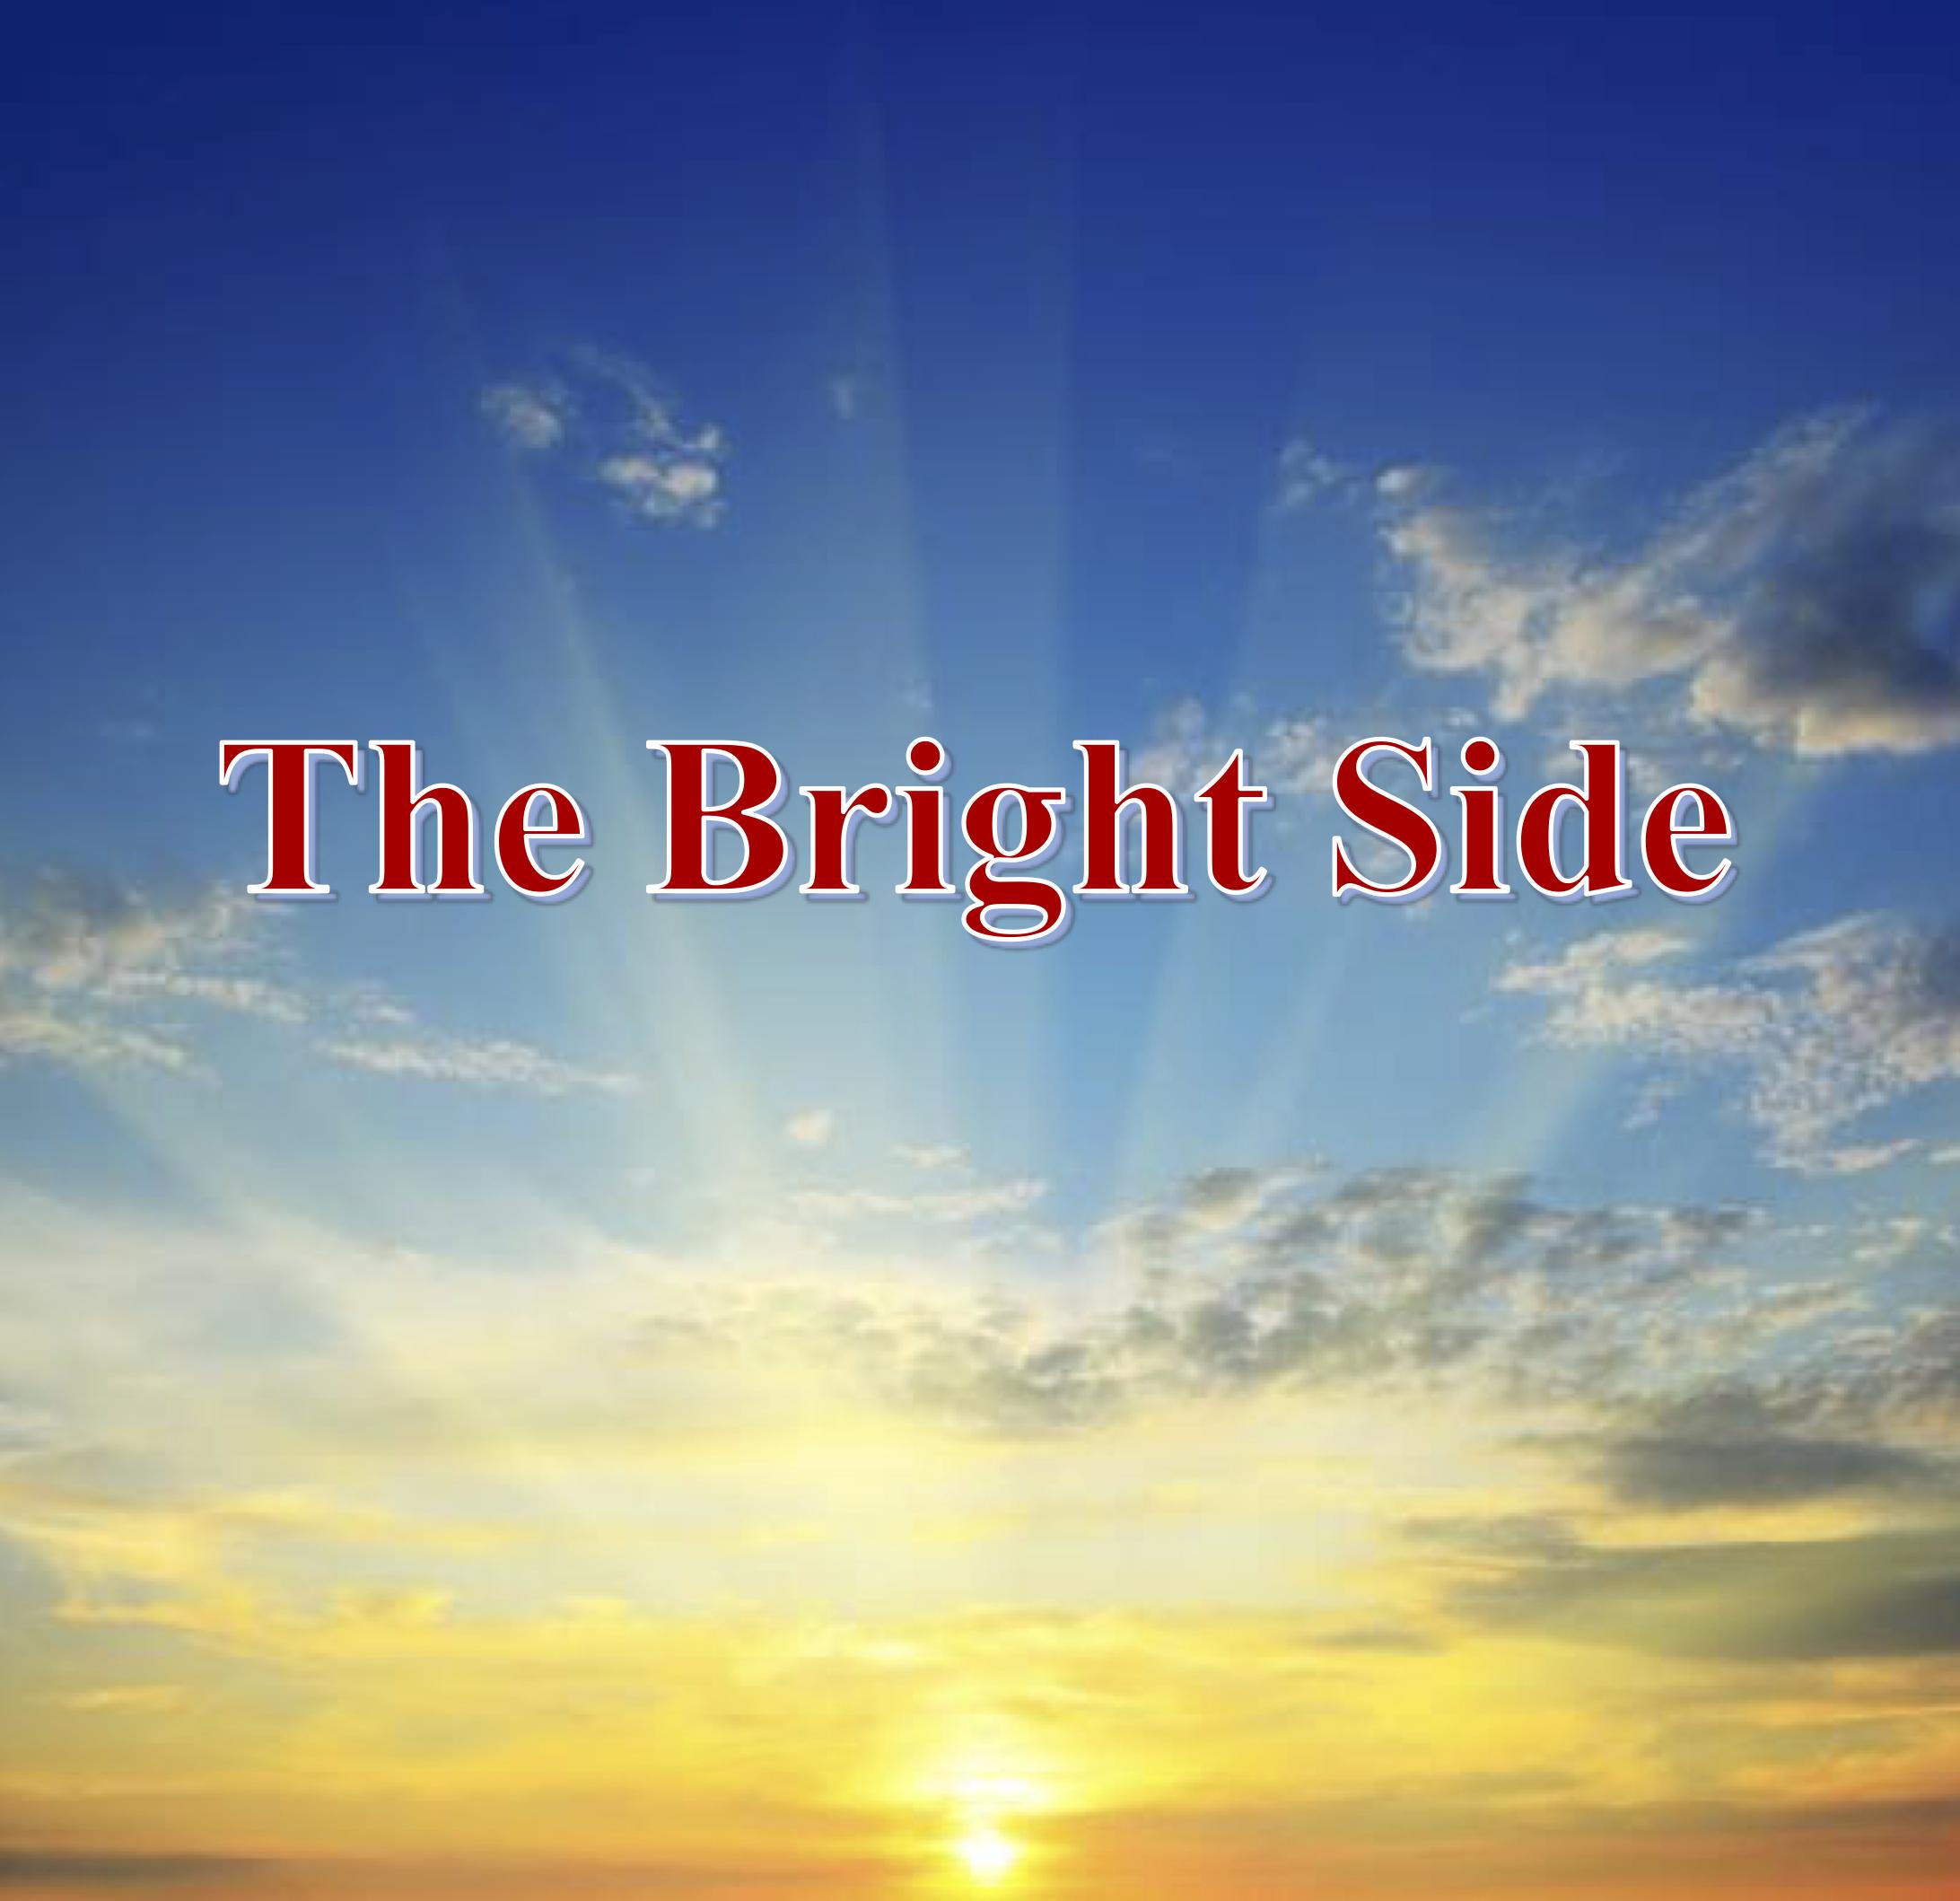 Bright Side Graphic.jpg